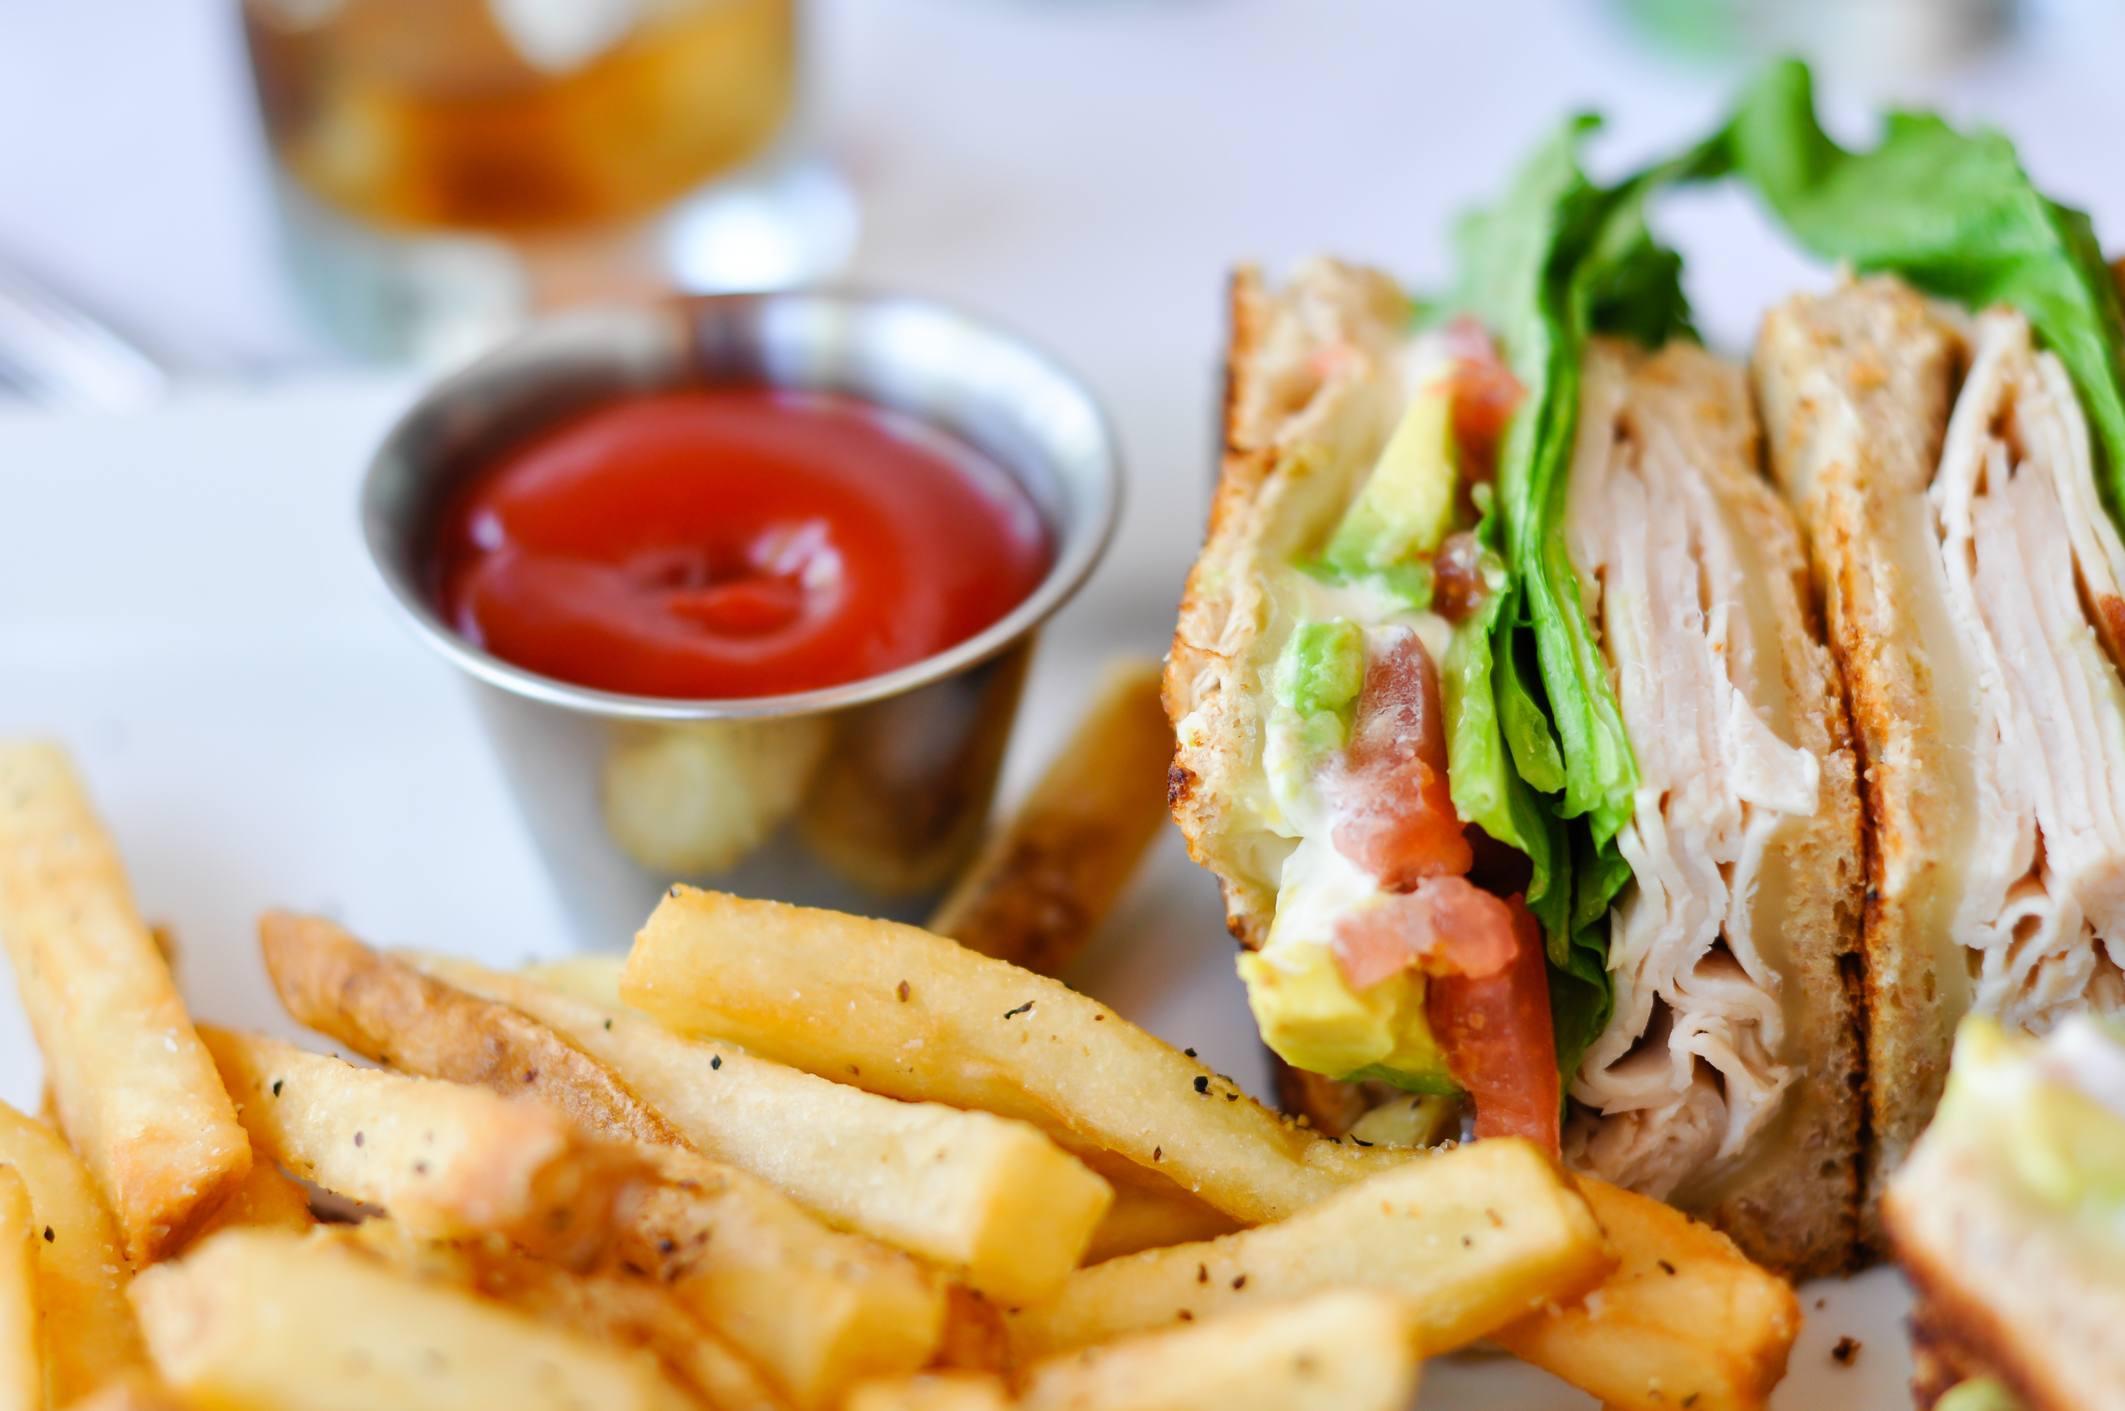 Sandwich de Pavo y Aguacate